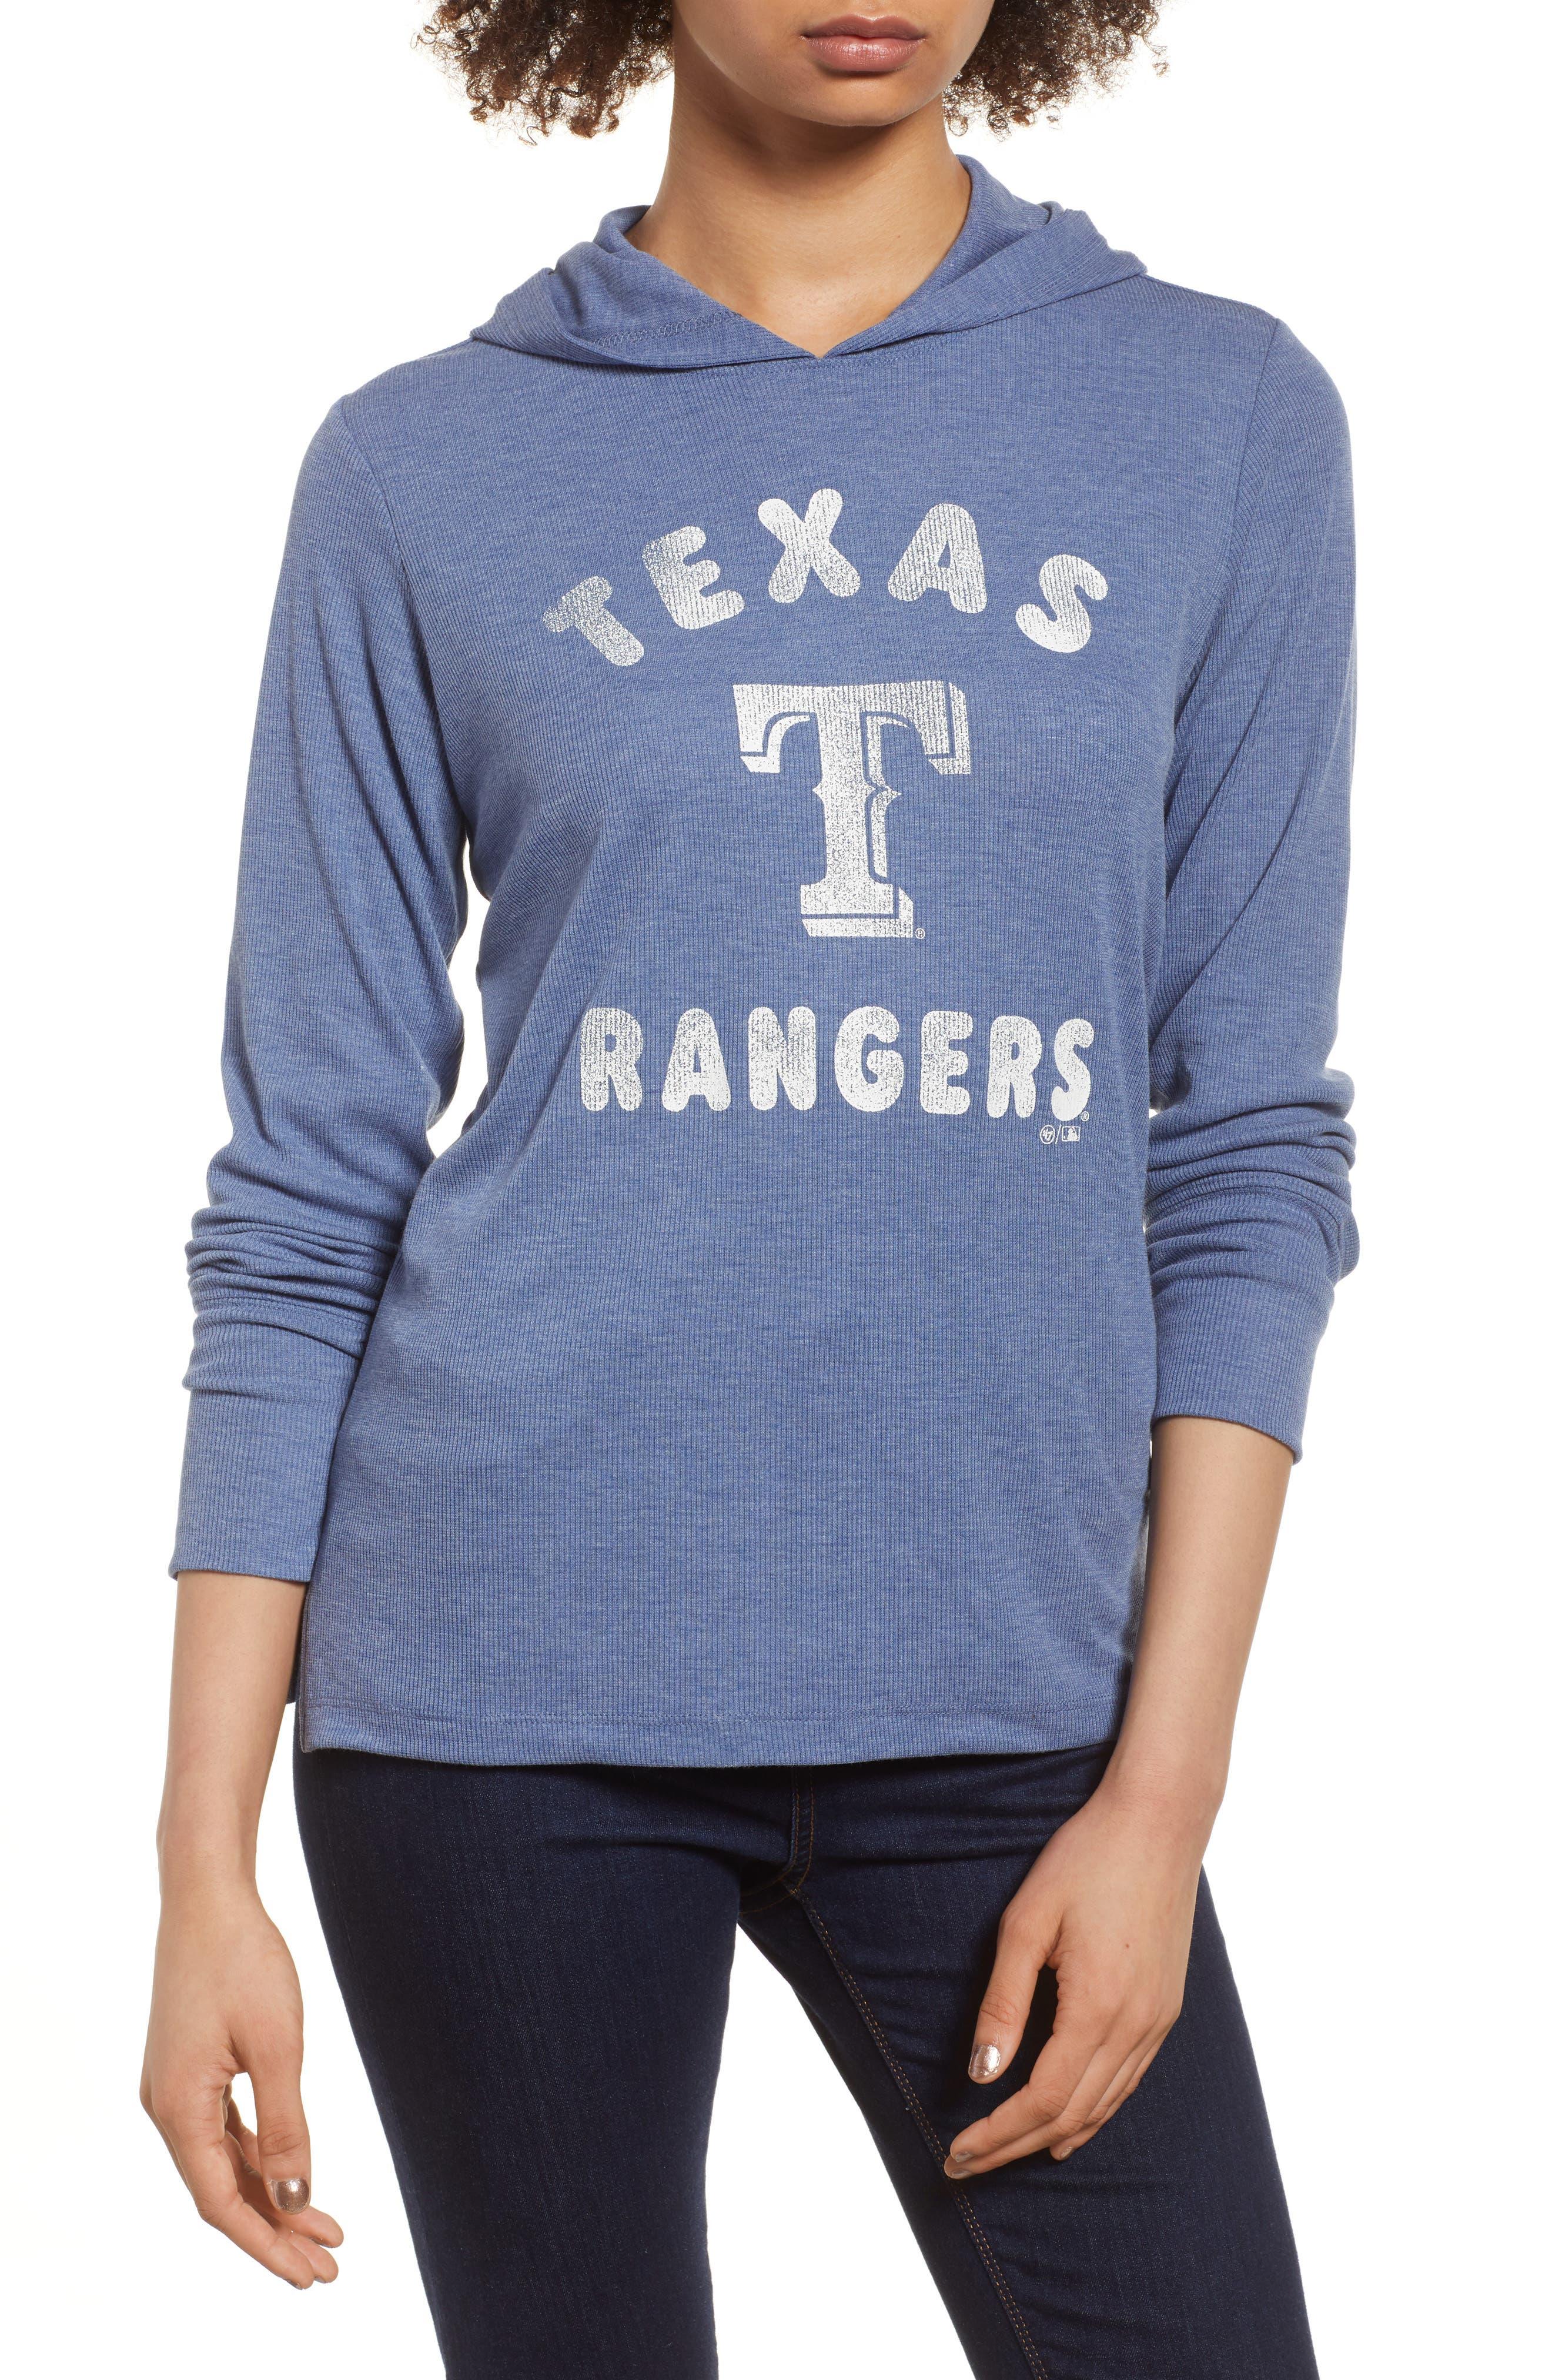 Campbell Texas Rangers Rib Knit Hooded Top,                             Main thumbnail 1, color,                             Bleacher Blue